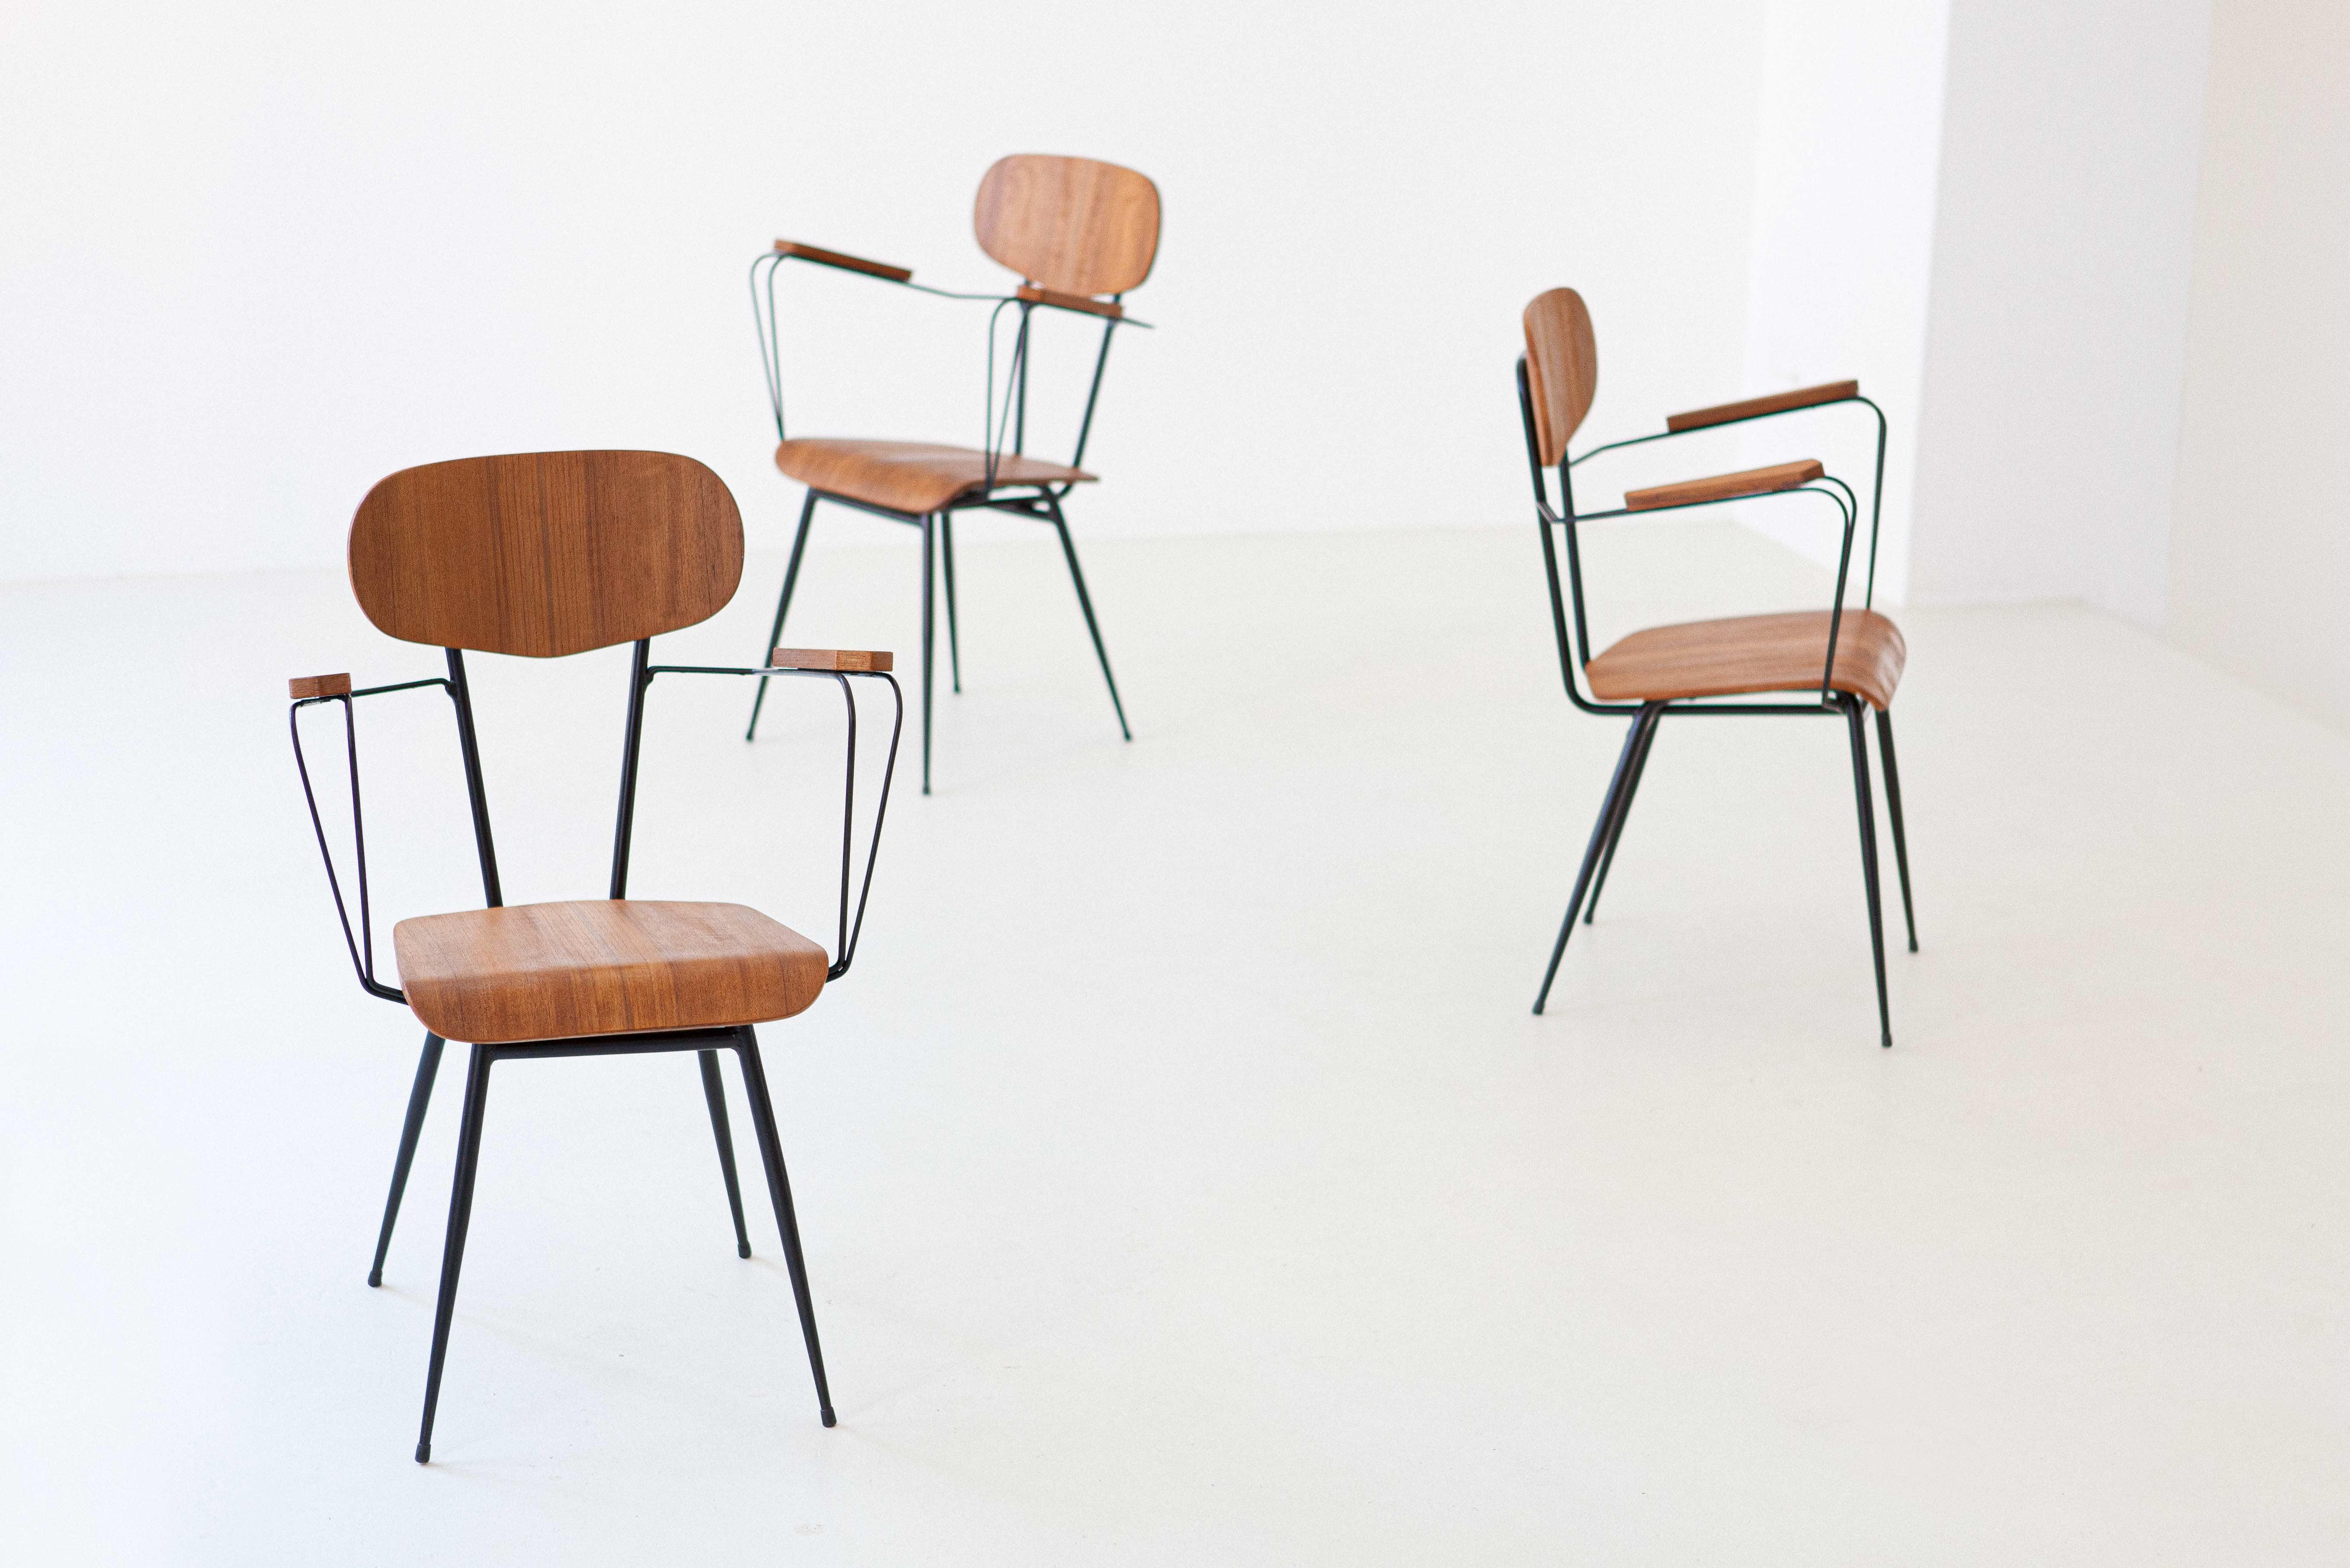 1950s-italian-set-of-four-teak-and-iron-chairs-10-se303